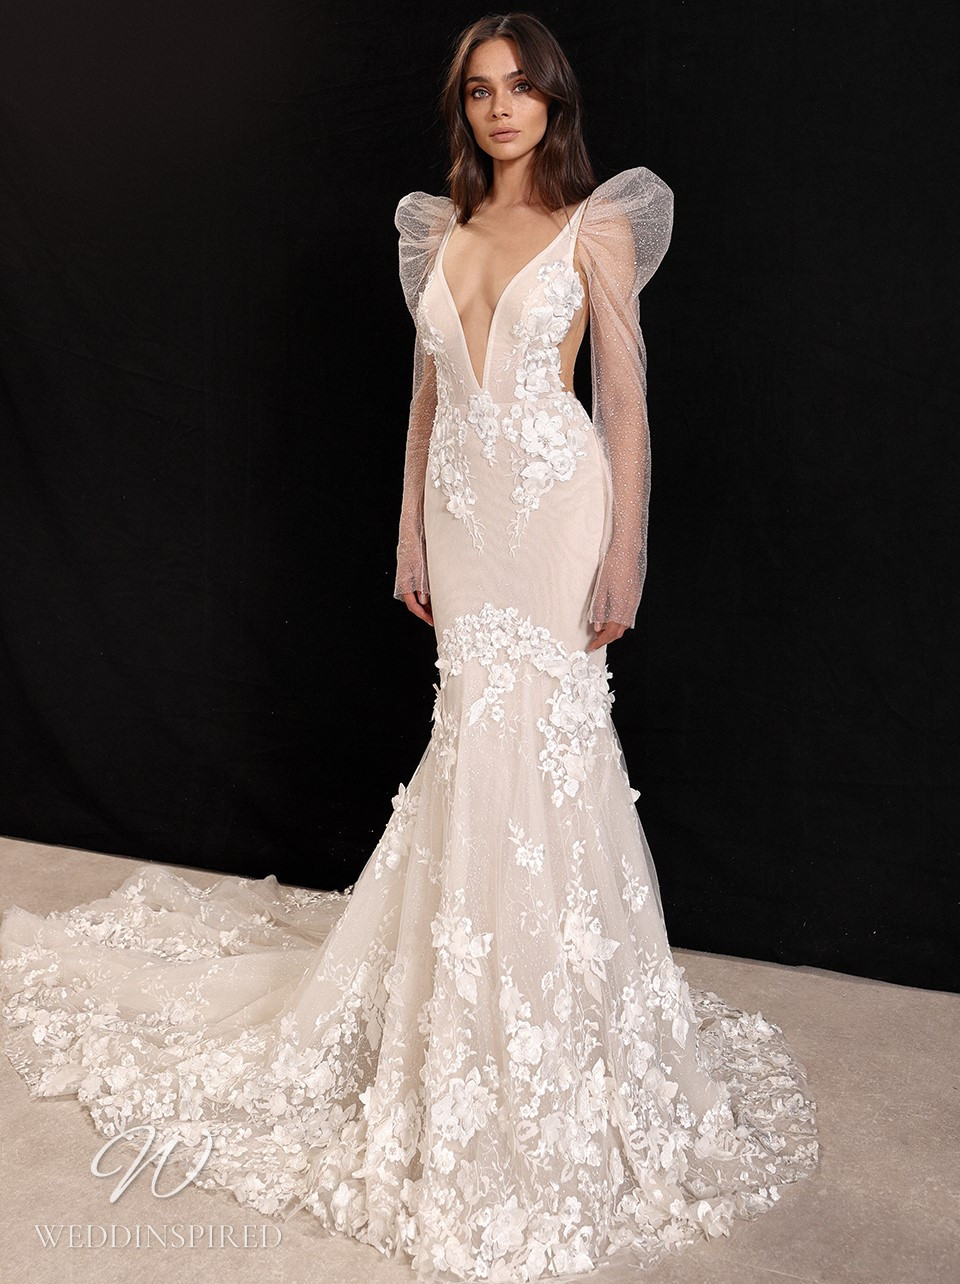 A Galia Lahav 2022 lace mermaid wedding dress with long sleeves